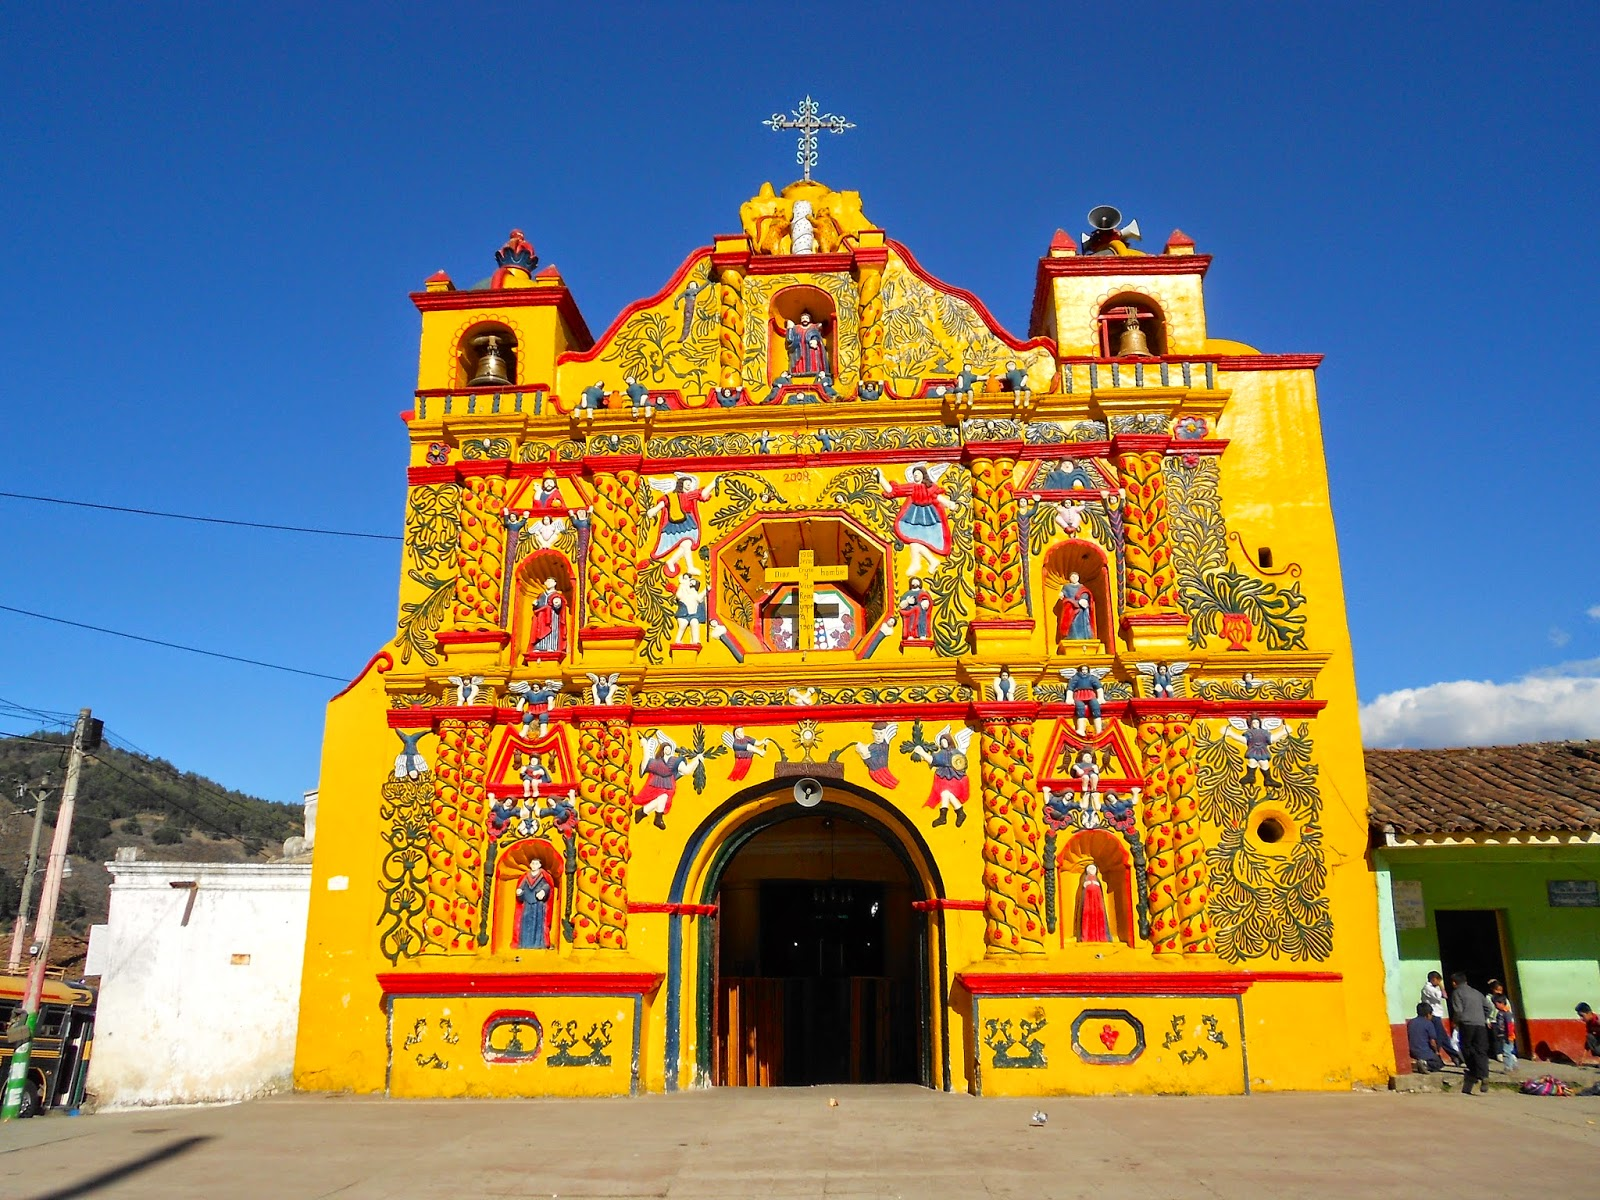 Guatemala, Quetzaltenango, San Andres Xecul Church